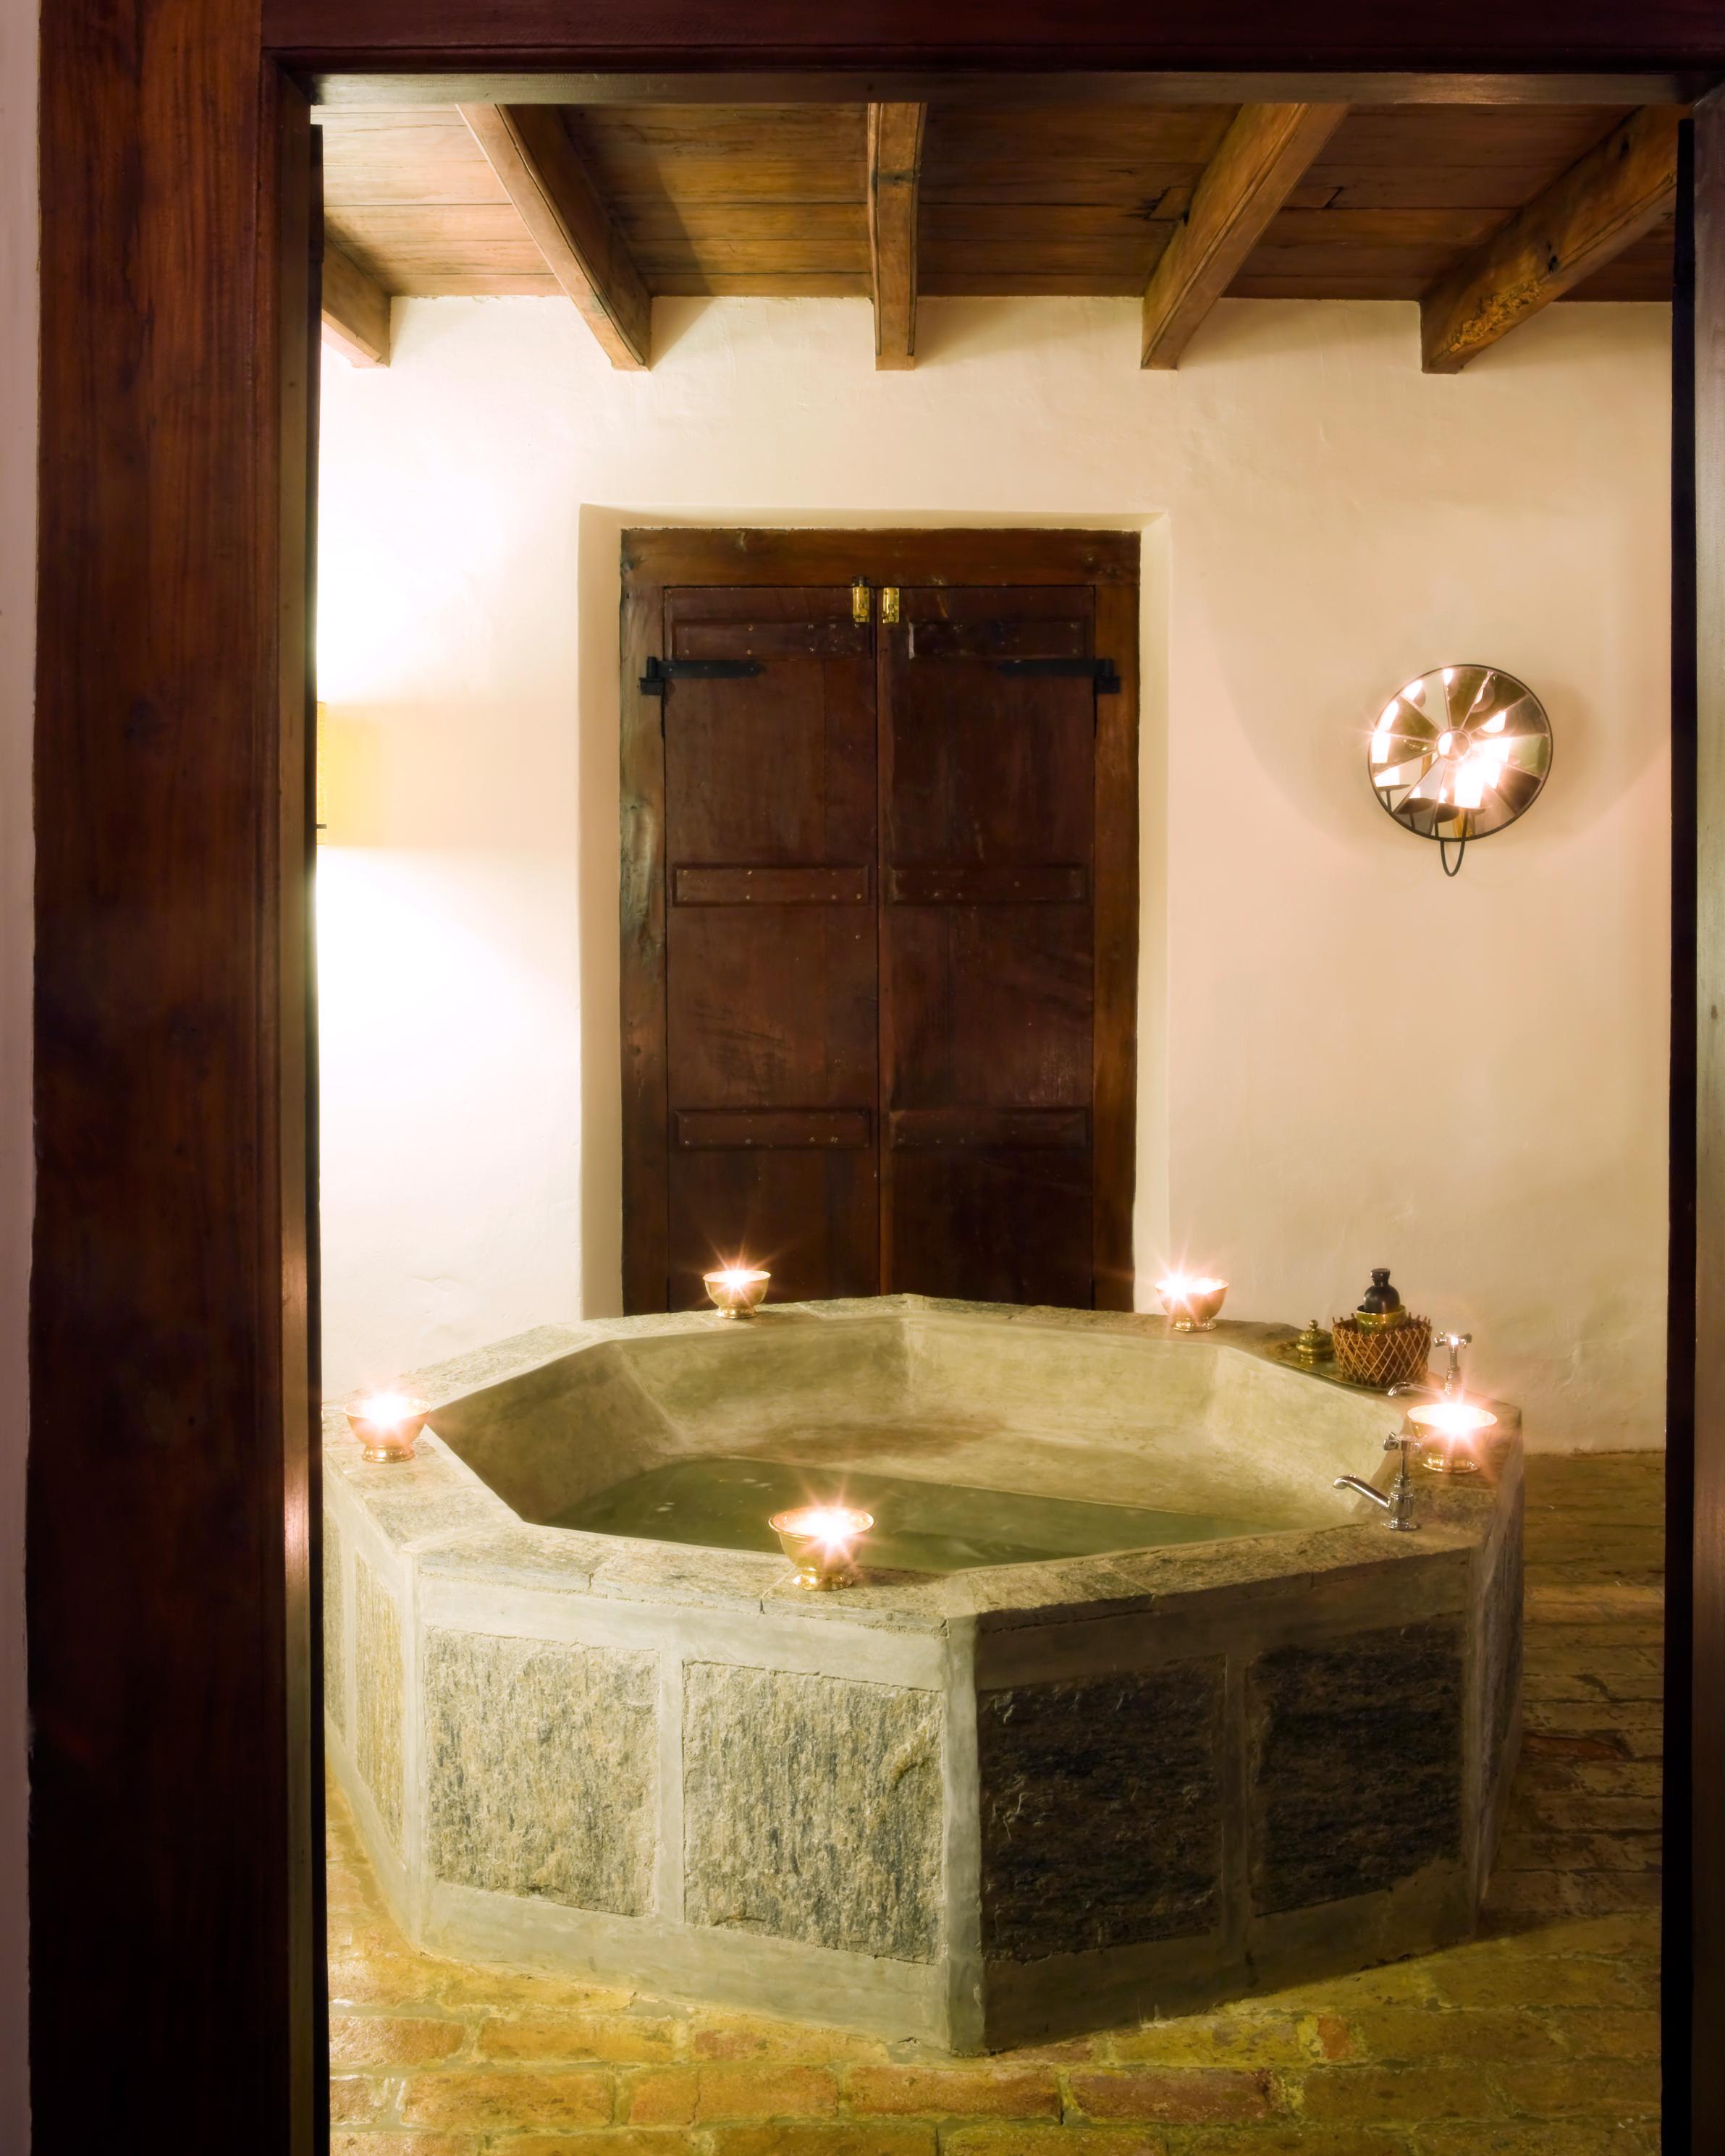 mr-mrs-smith-travel-hotels-wd0413-kandy-house-black-rajah-bath.jpg